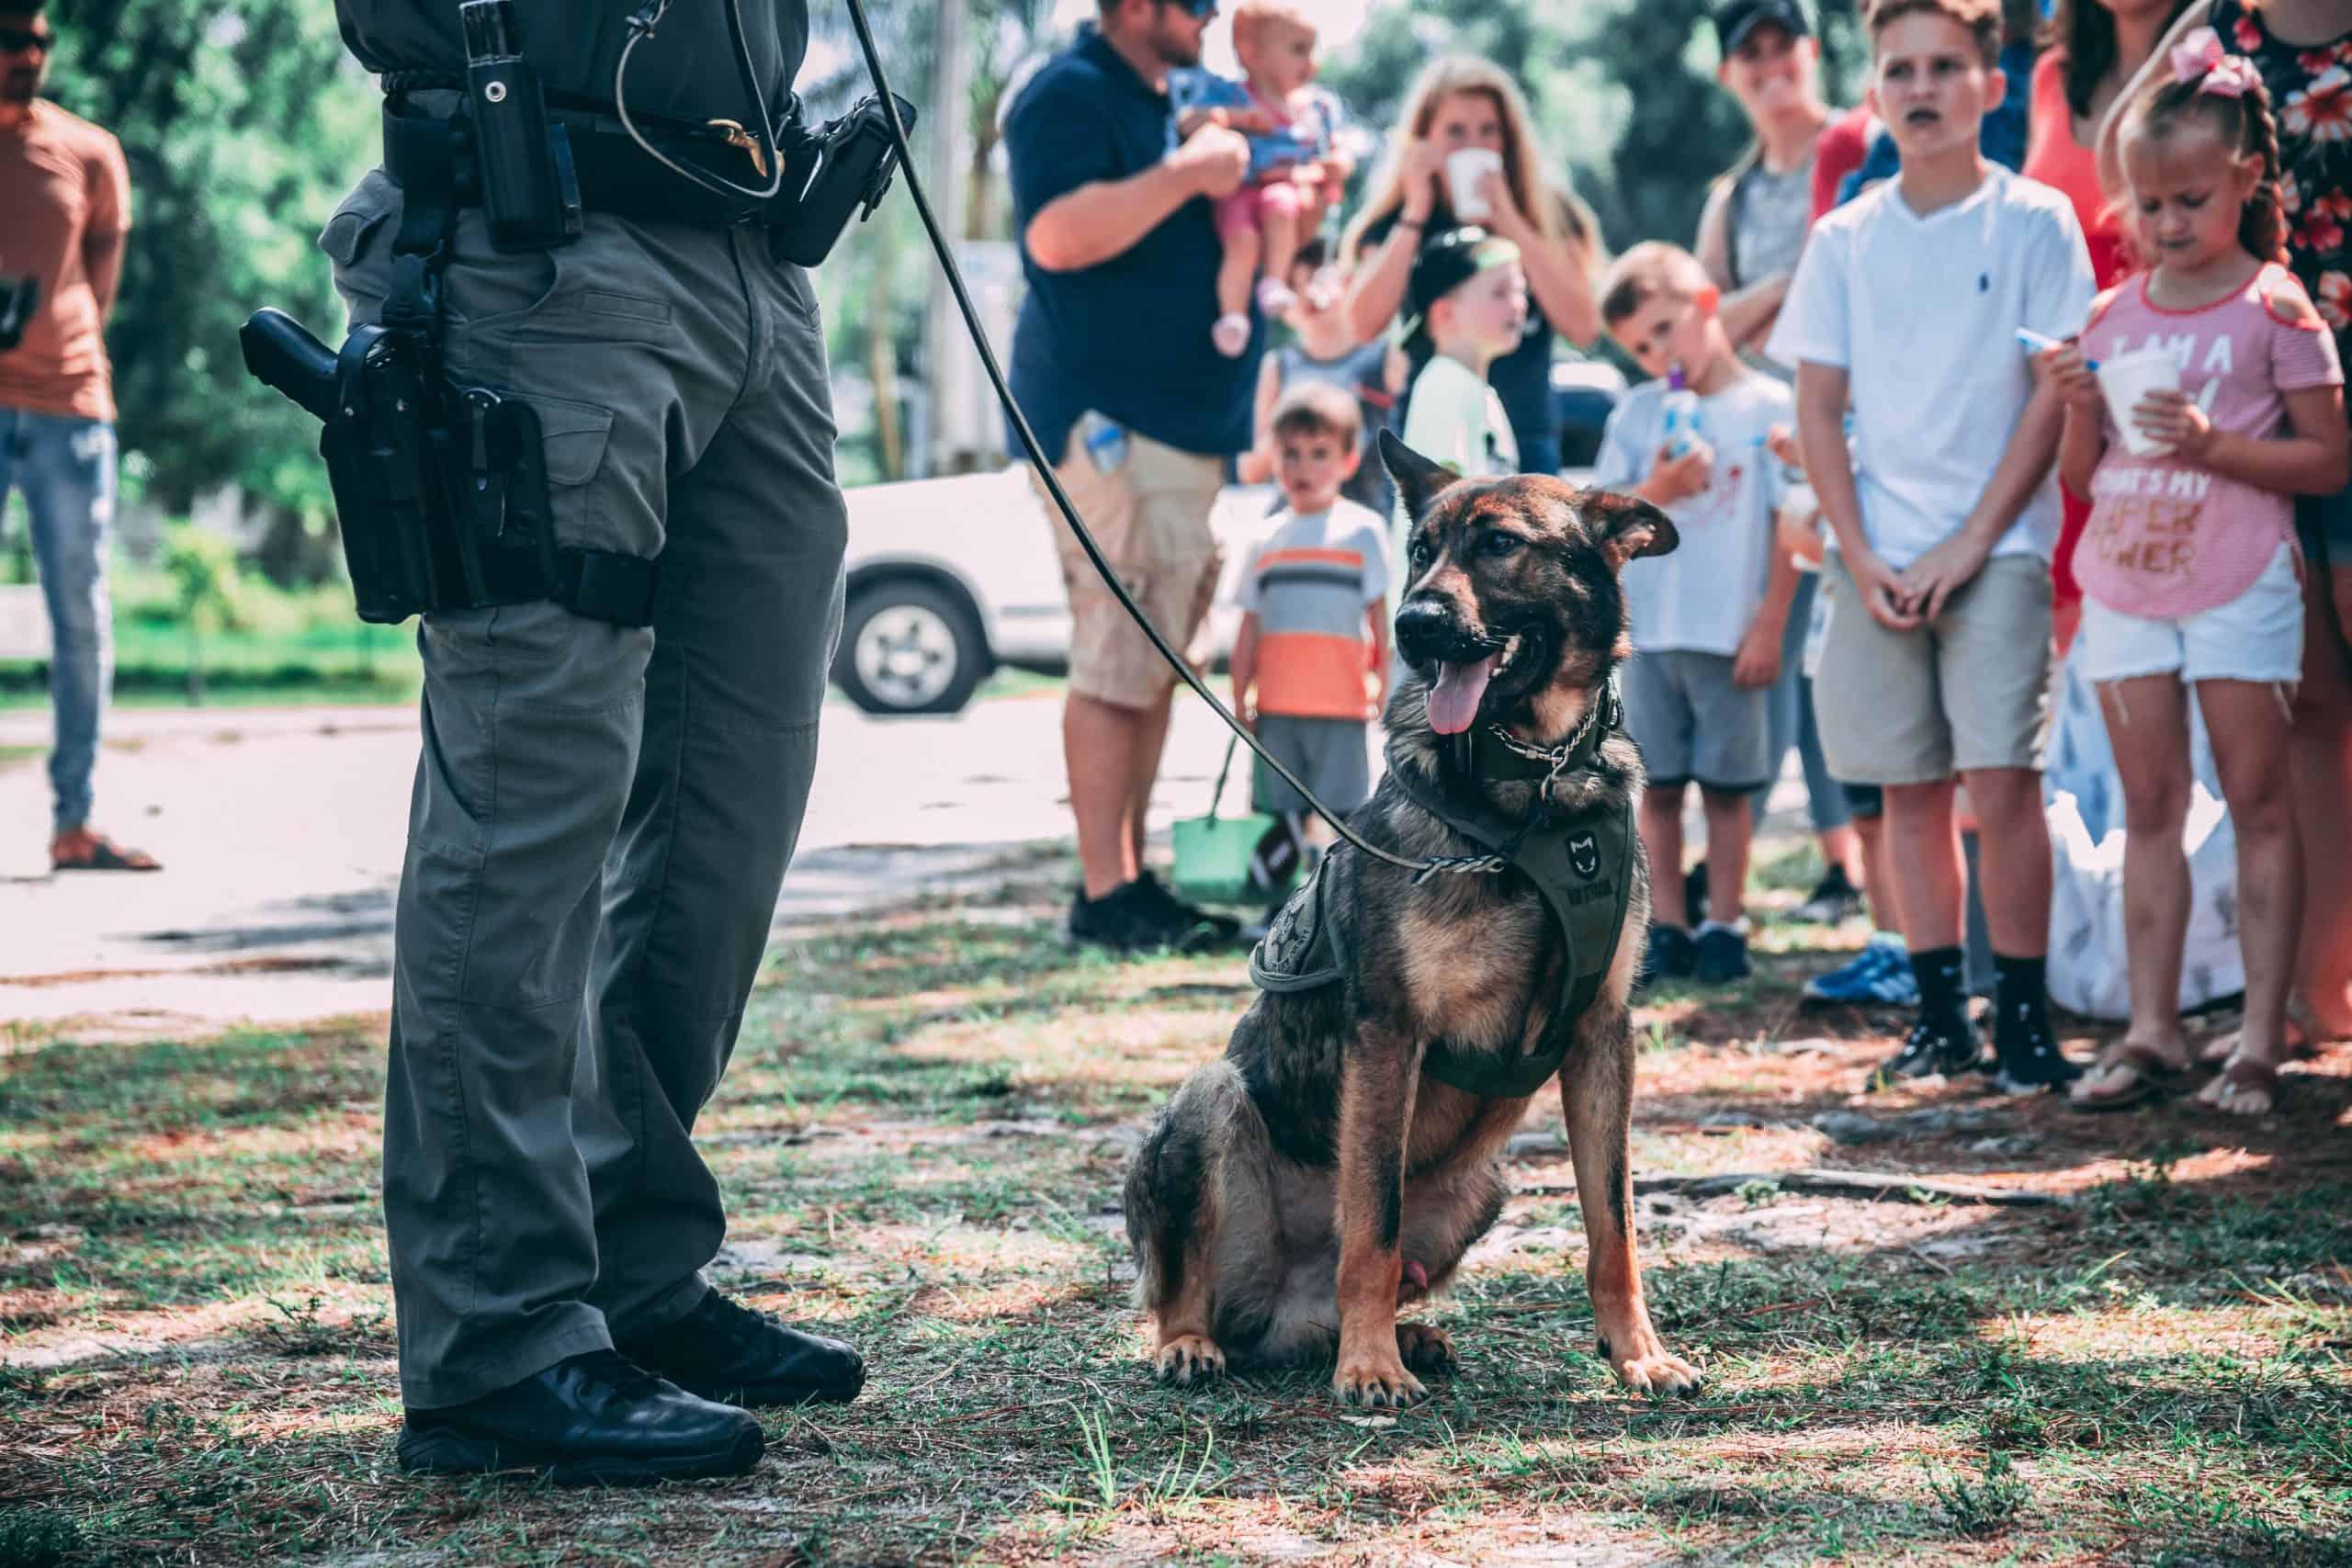 Malinois as a police working dog.